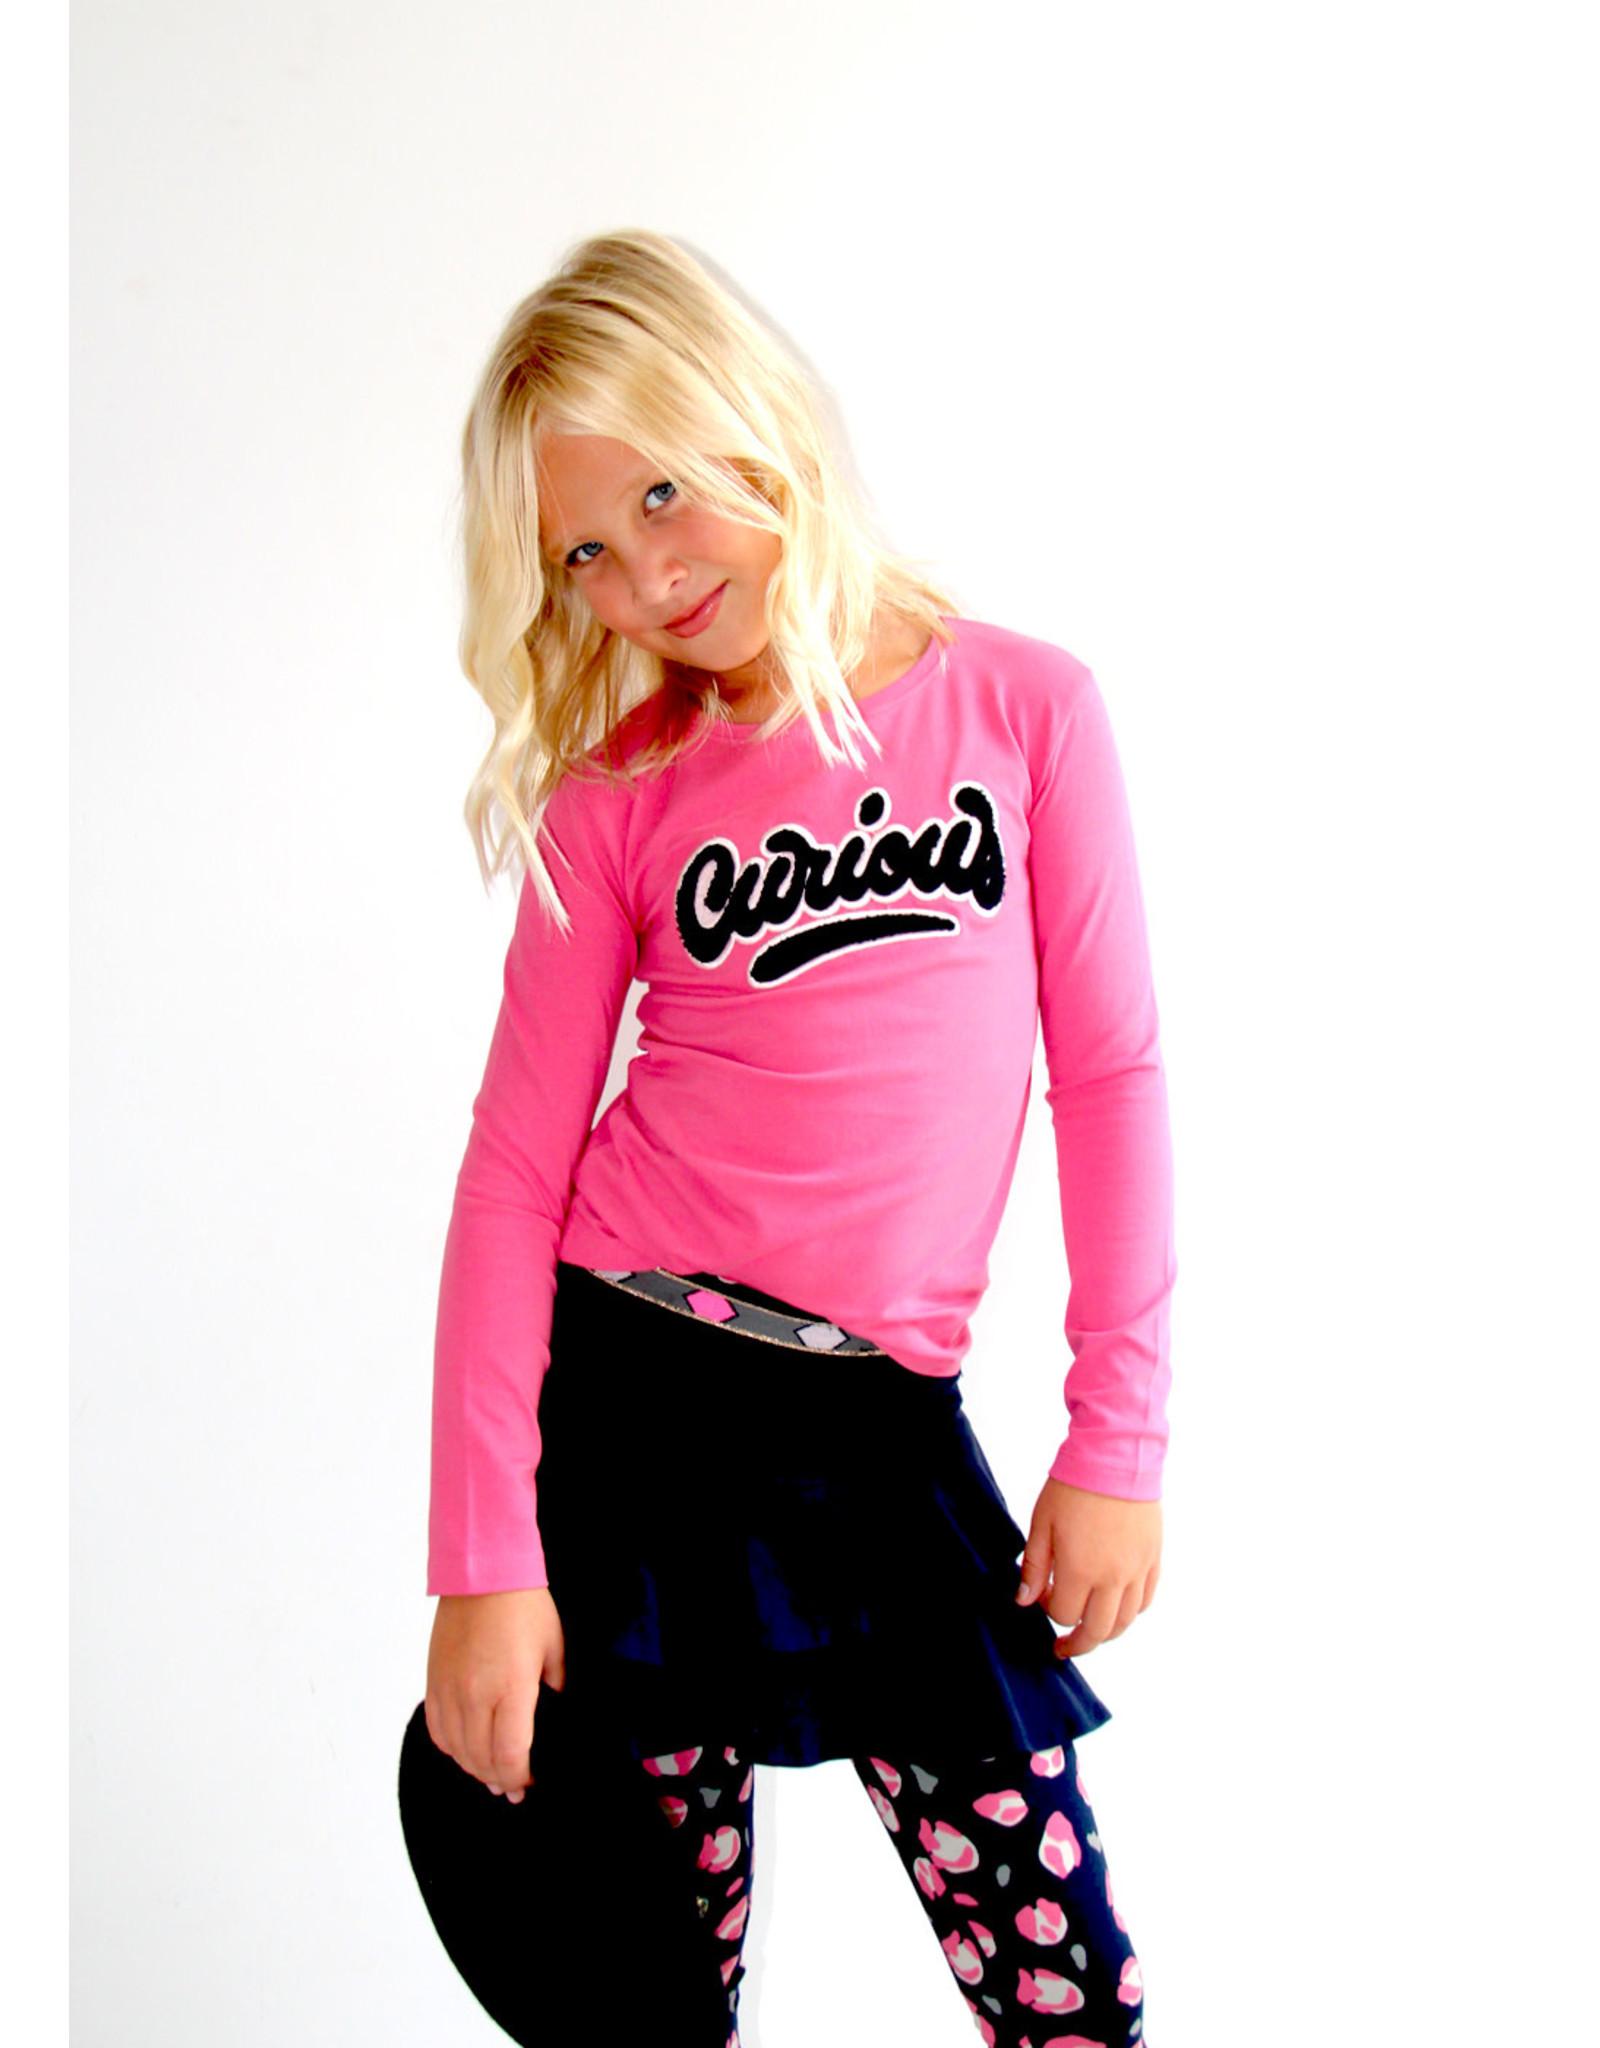 Topitm Topitm meisjes shirt Abigail